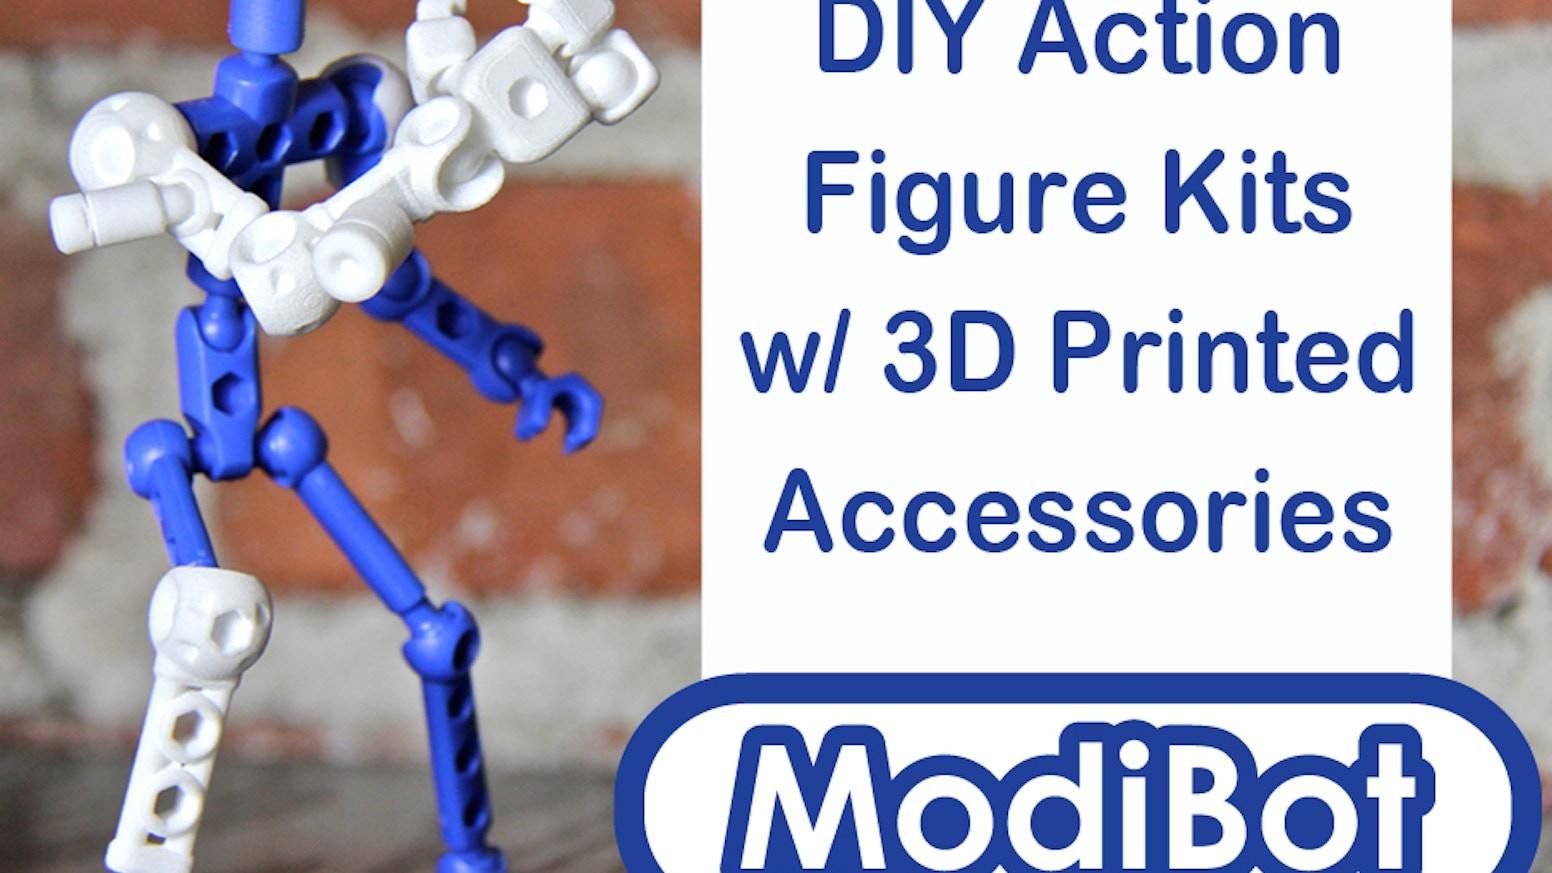 Modibot Mo Diy Action Figures With 3d Printed Accessories By Go Go Dynamo Kickstarter